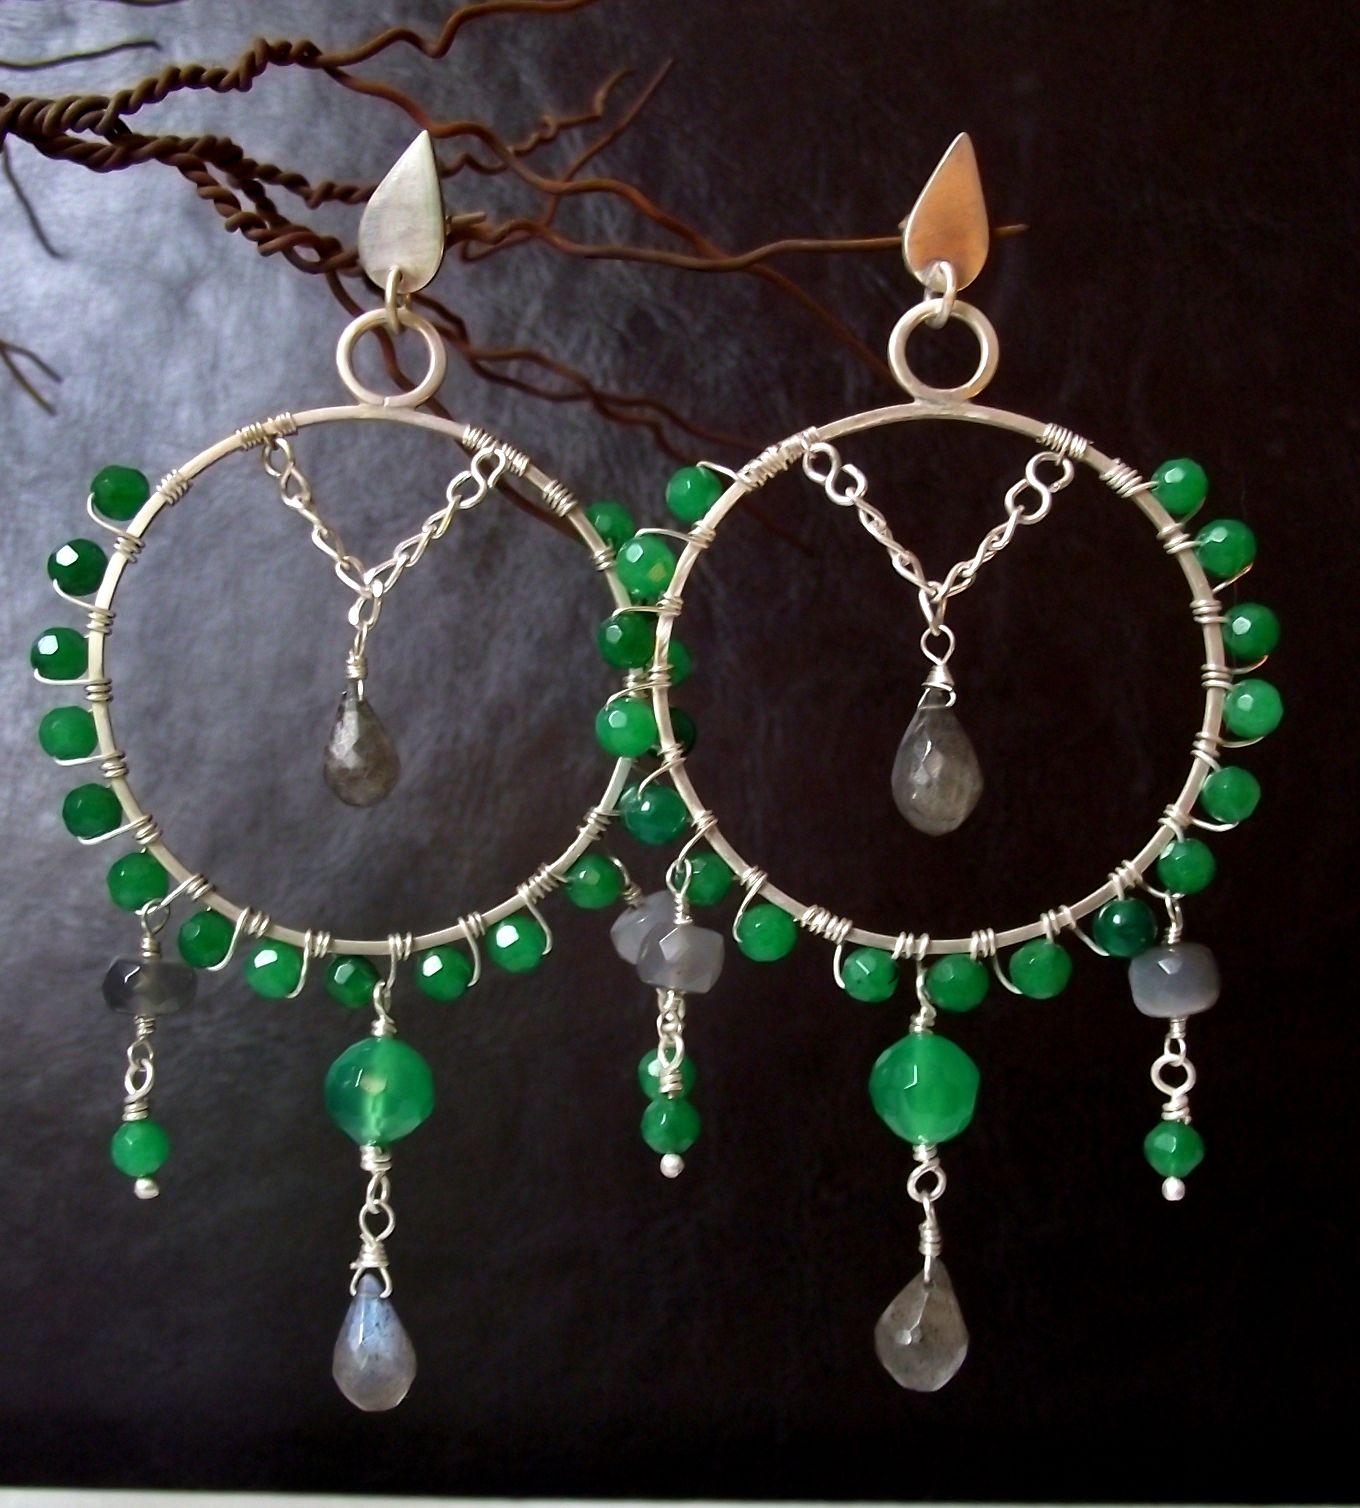 Aros Chandelier Jade Labradorita Y Plata Usd 68 34 000 Clp Hand Made Jewelry Jewelry Making Jewelry